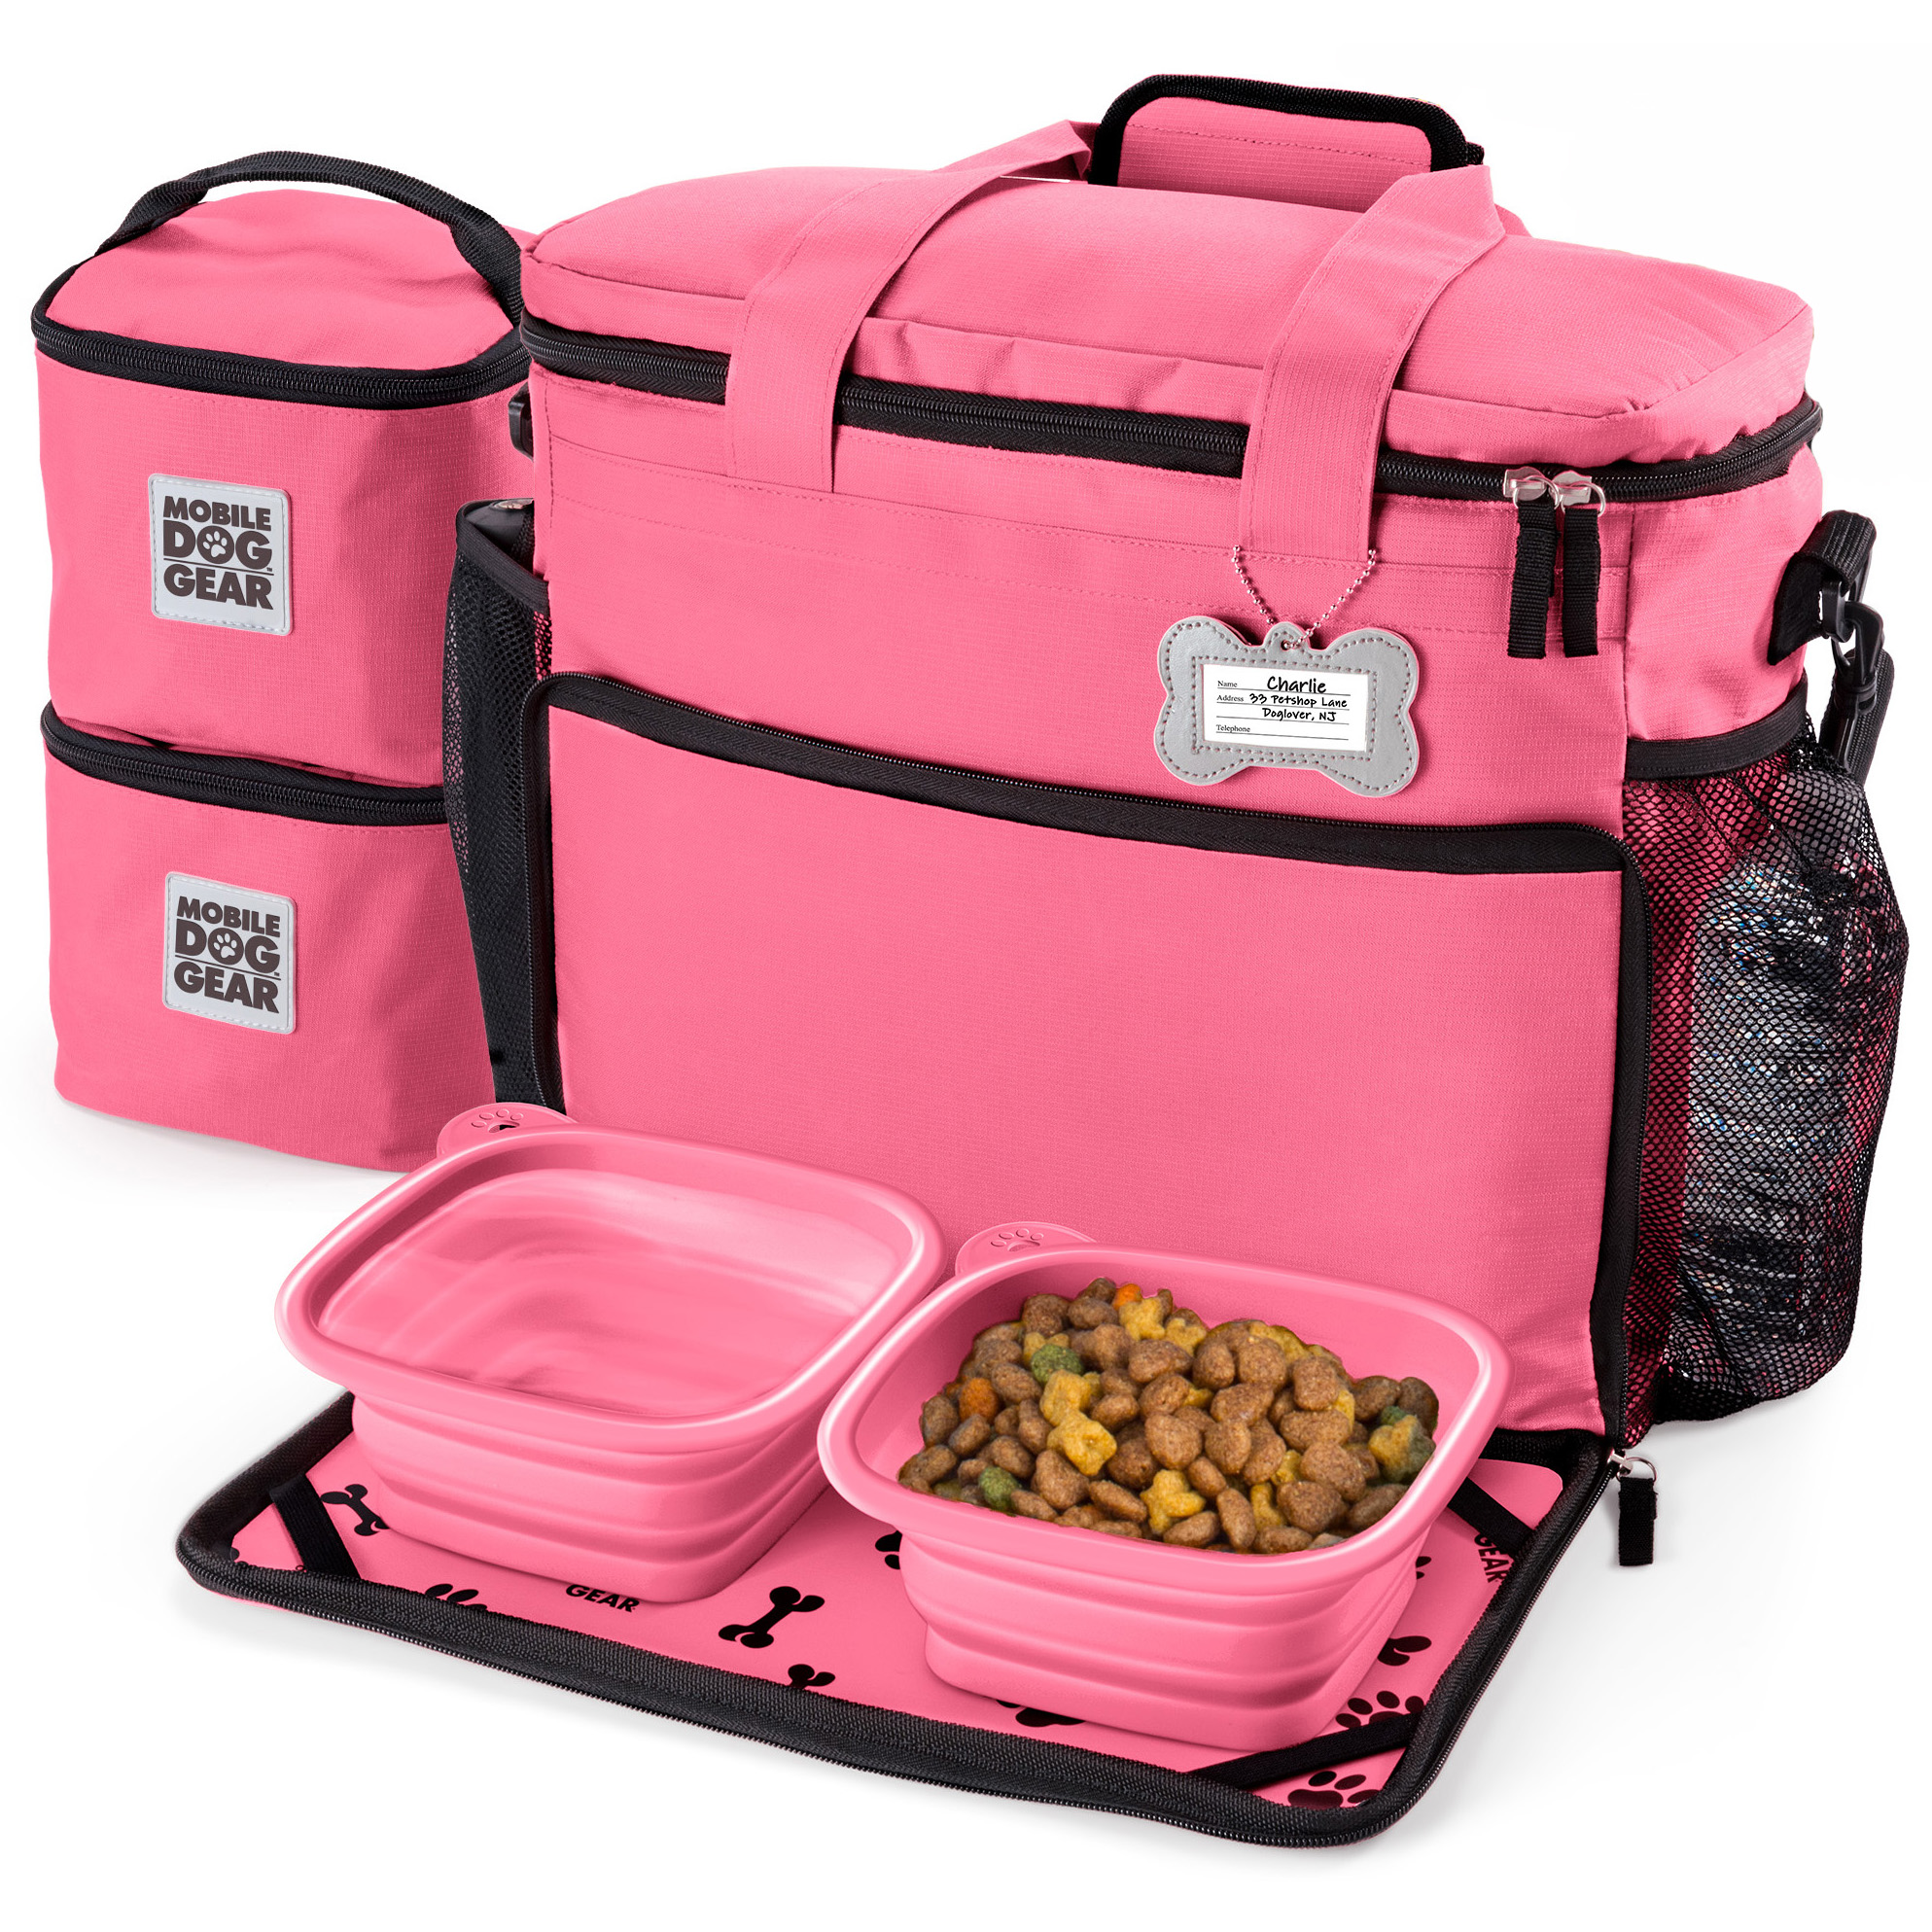 1a - MDG ML Week Away-Pink-Main Beauty Shot -Bag Closed.jpg